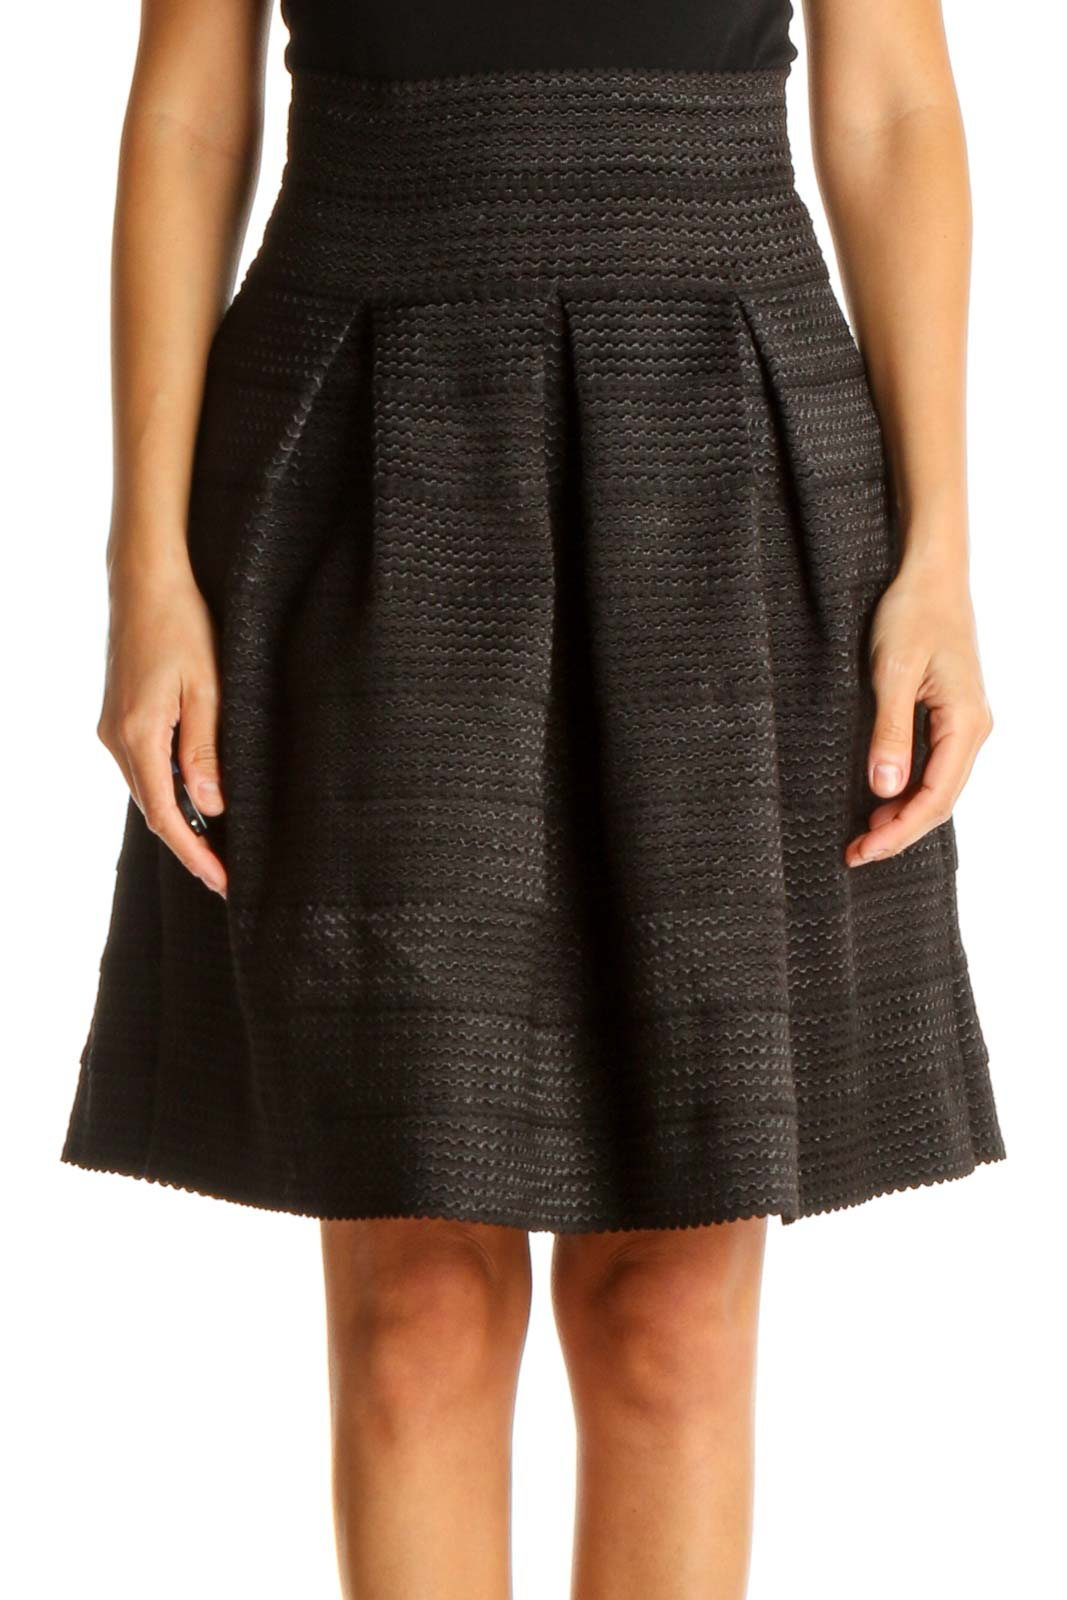 Black Textured Brunch A-Line Skirt Front